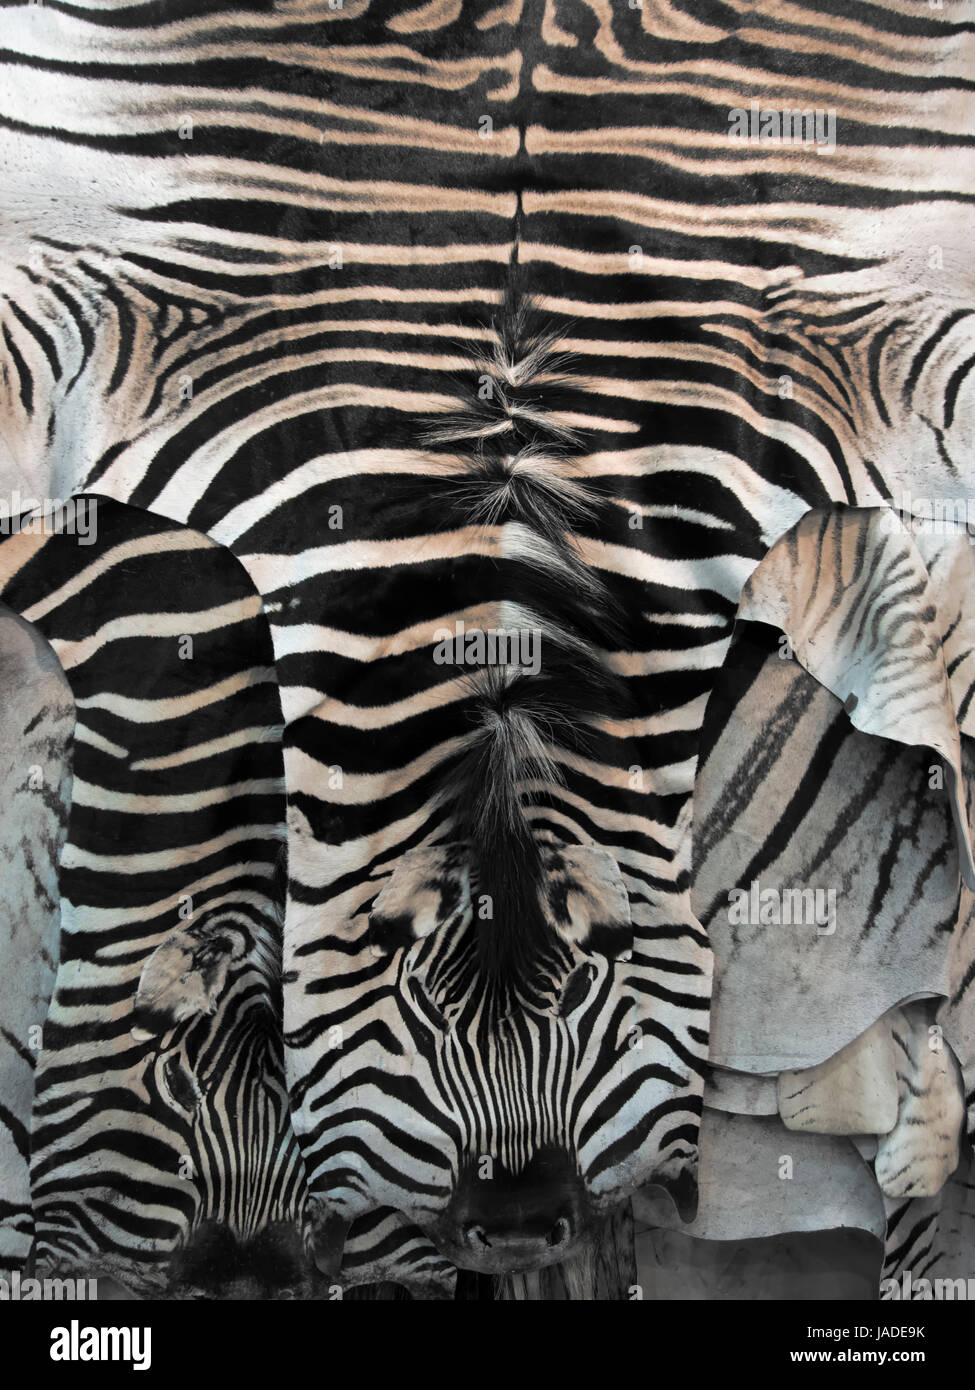 zebra rug stockfotos zebra rug bilder alamy. Black Bedroom Furniture Sets. Home Design Ideas